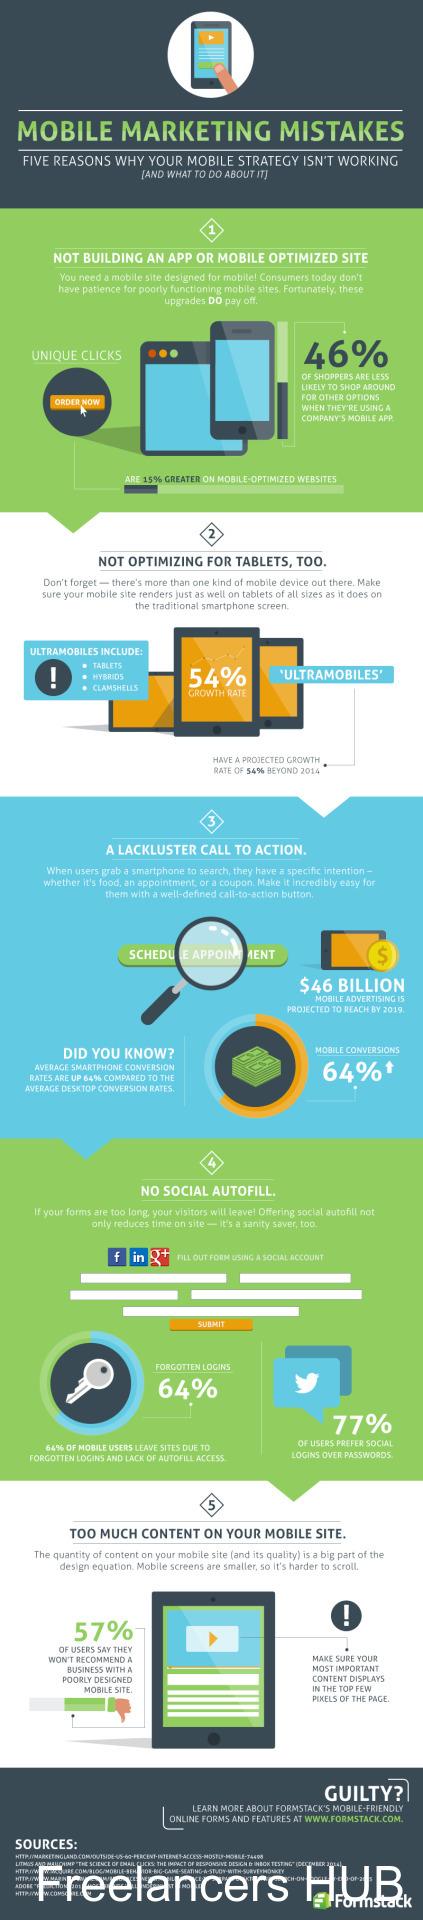 #mobilemarketing #mobilemarketinginfographic #mobile #marketinginfographic #infographic #digitalmarketing